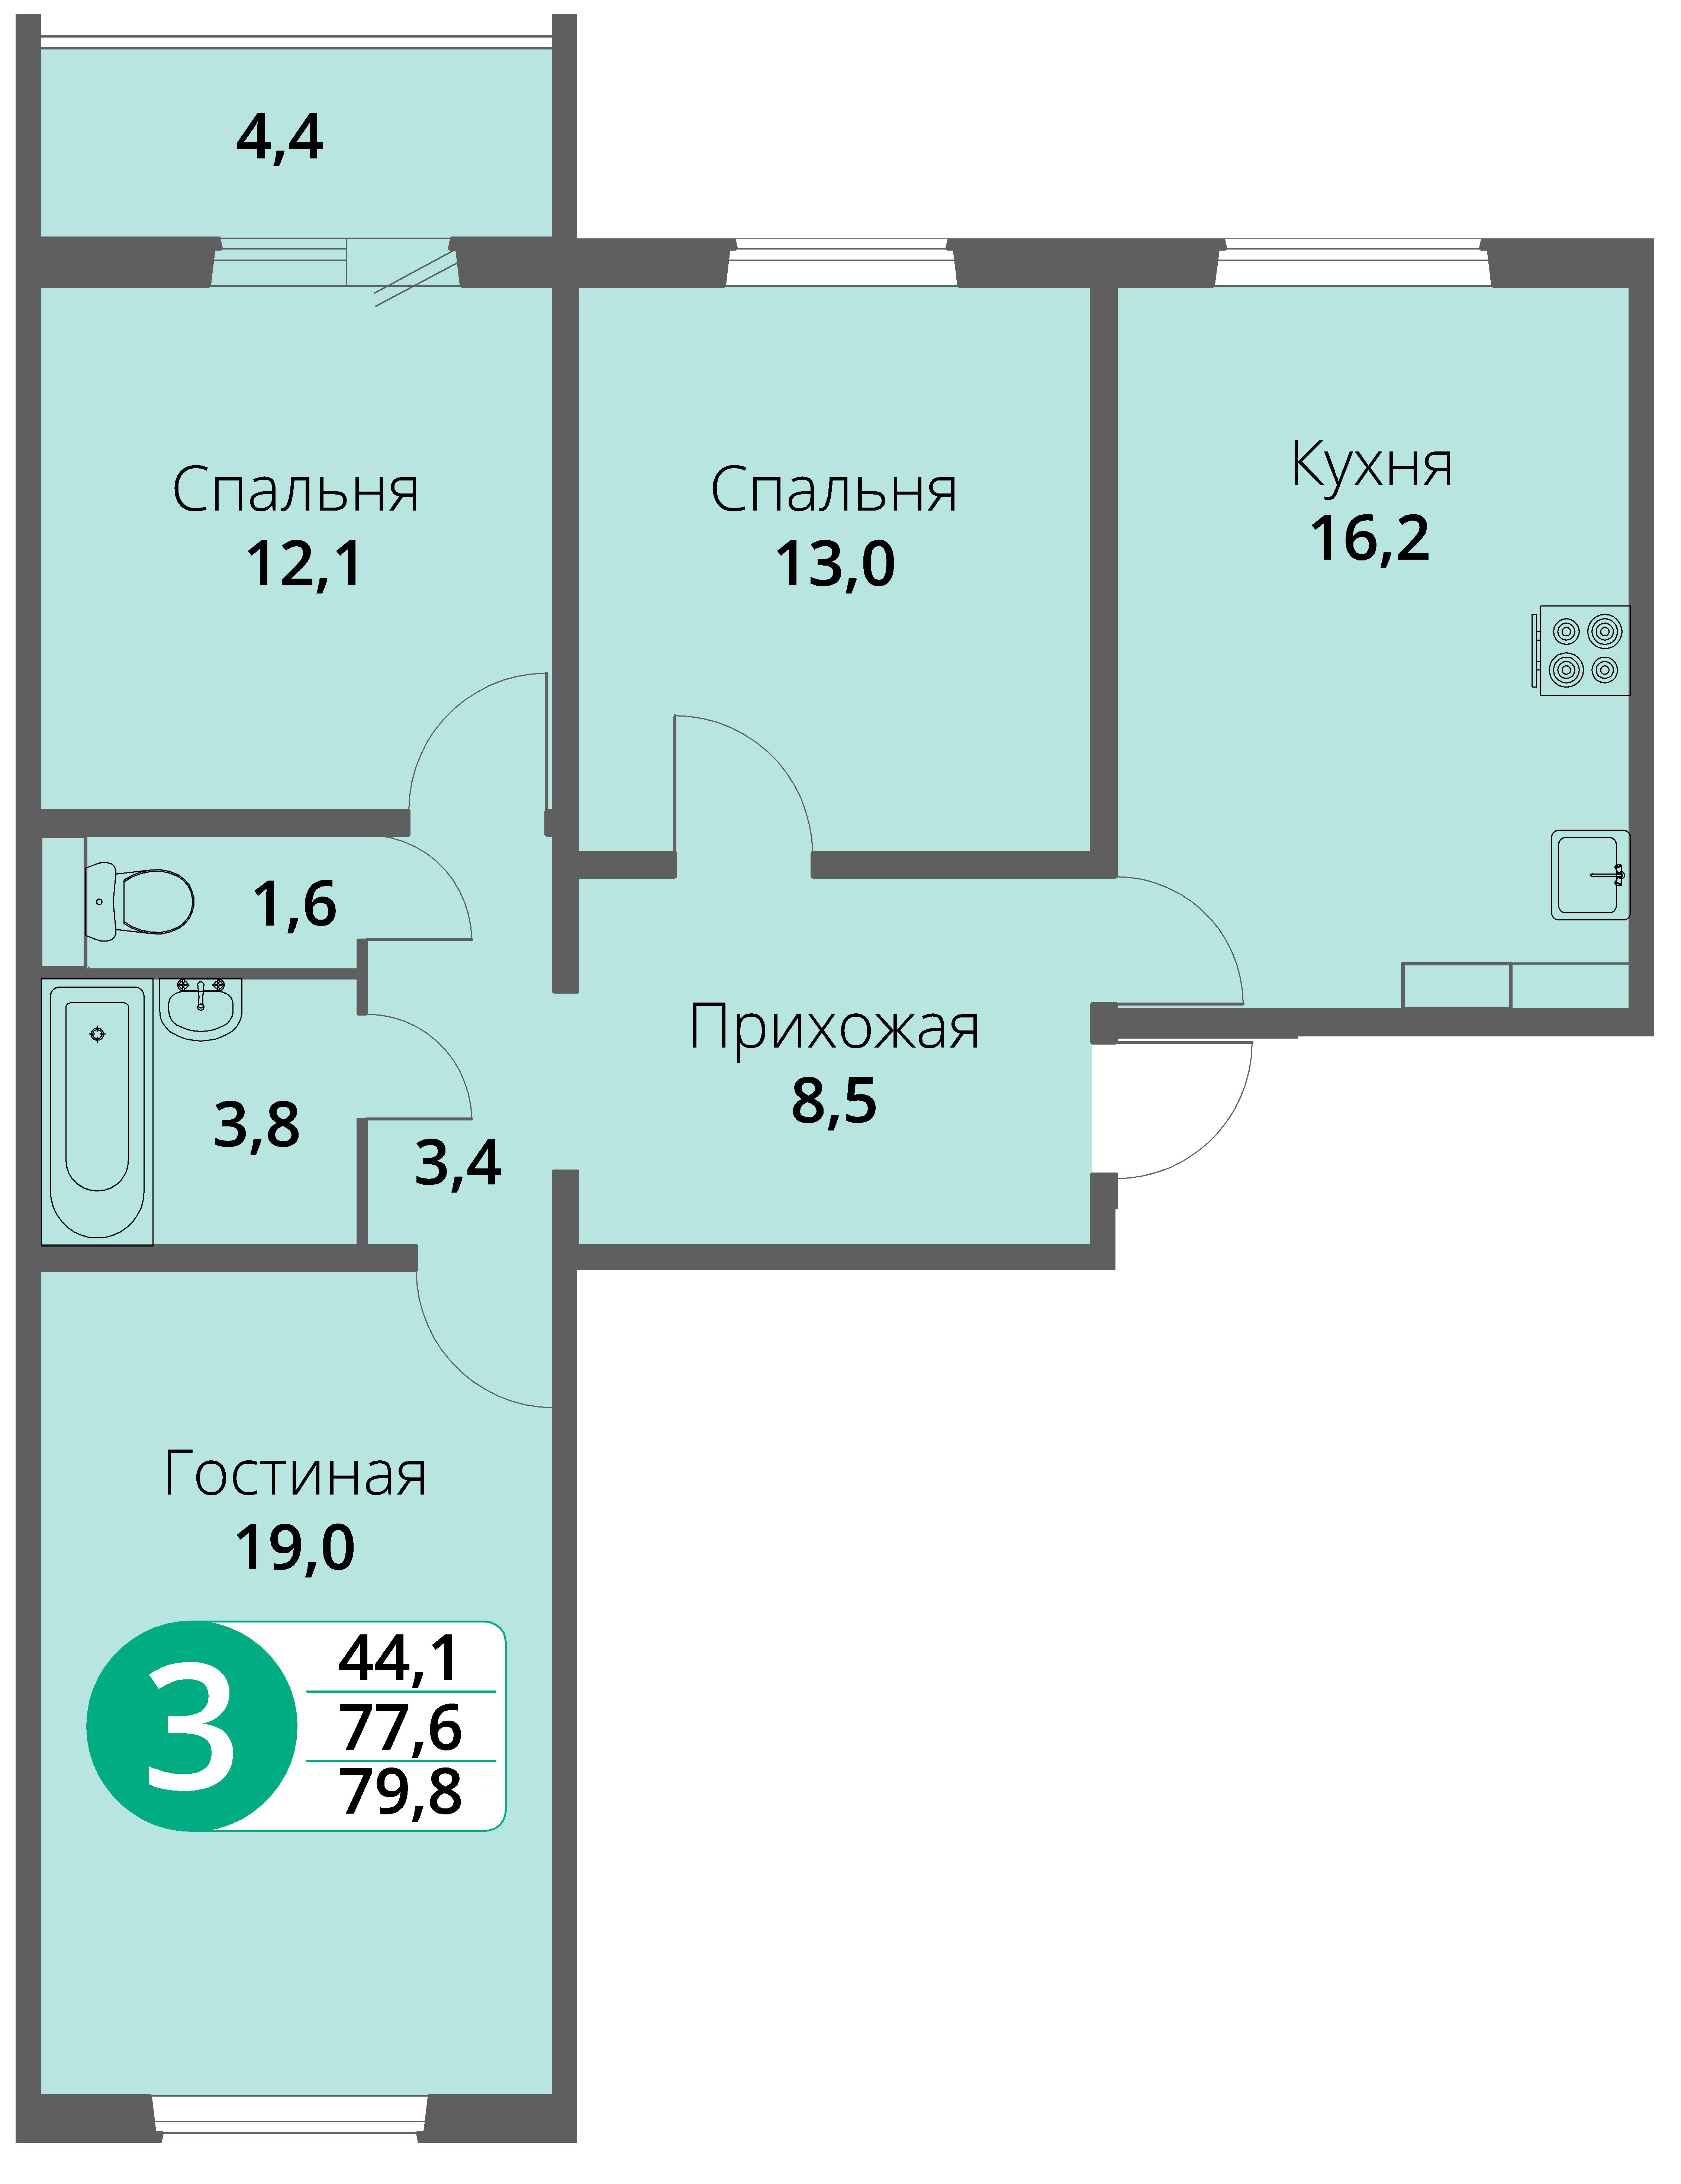 Зареченская 1-1, квартира 30 - Трехкомнатная